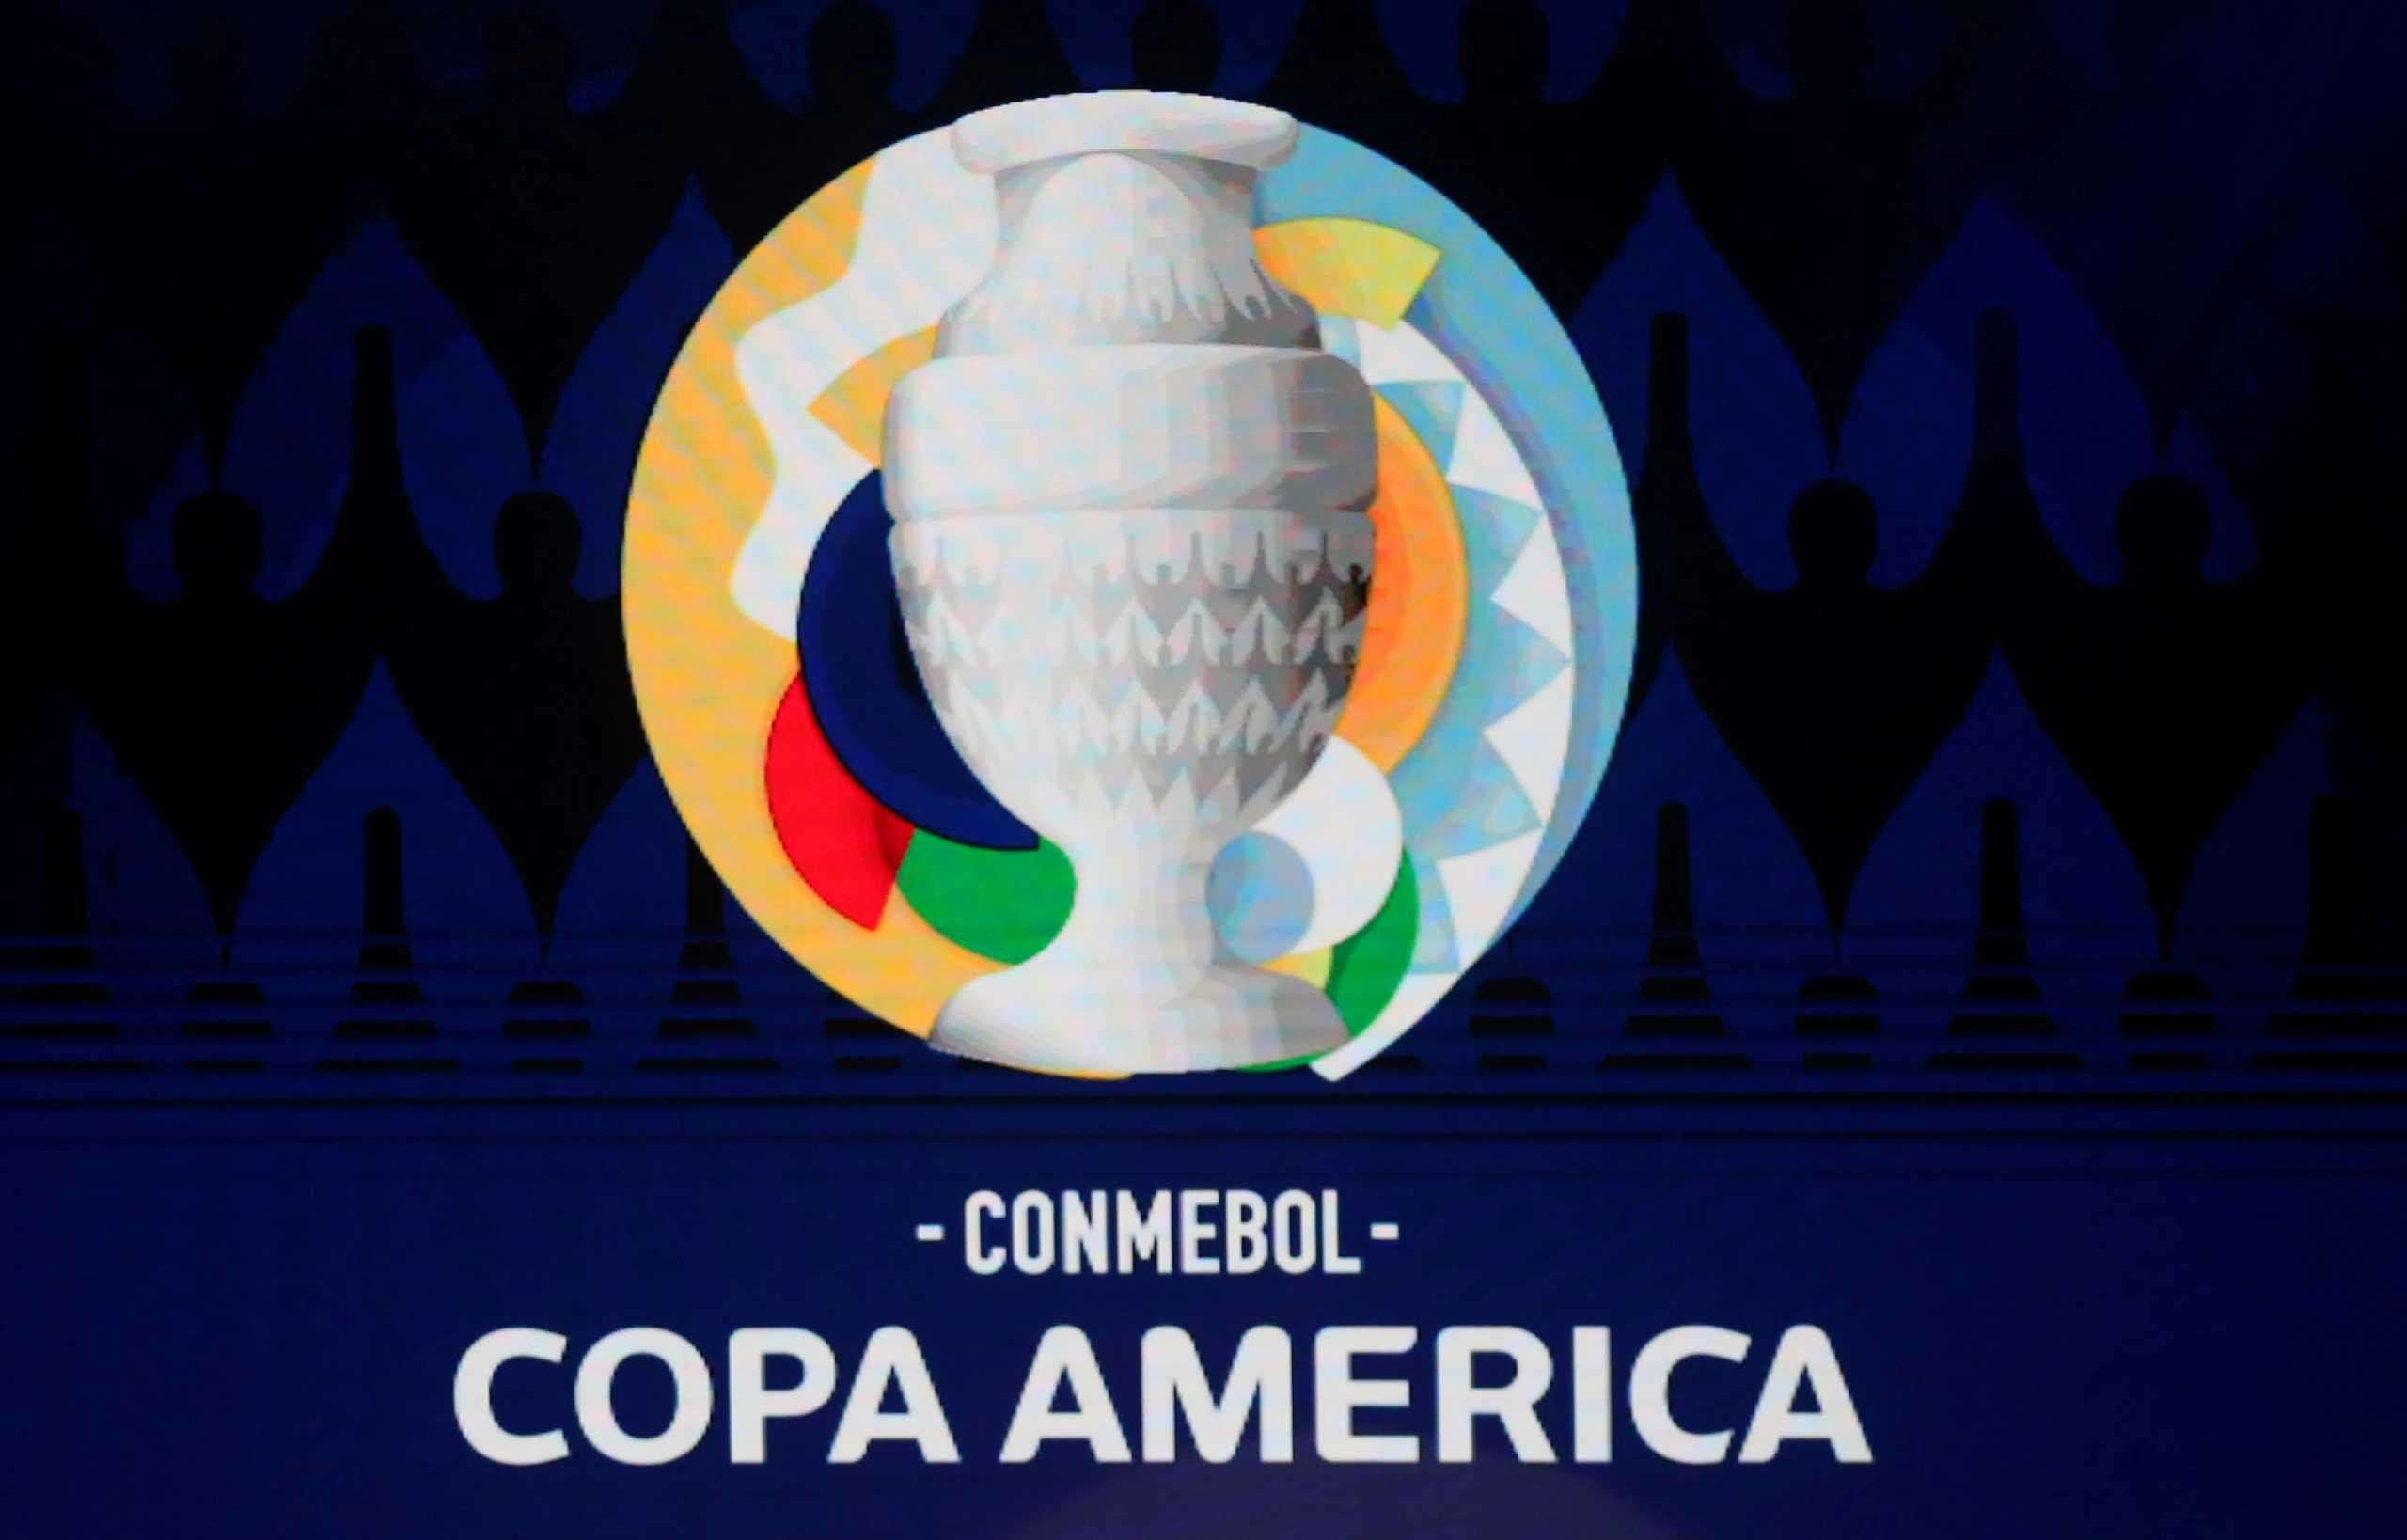 Copa America: Φίλαθλοι προσκόμισαν πλαστά τεστ κορονοϊού για να δουν τον τελικό